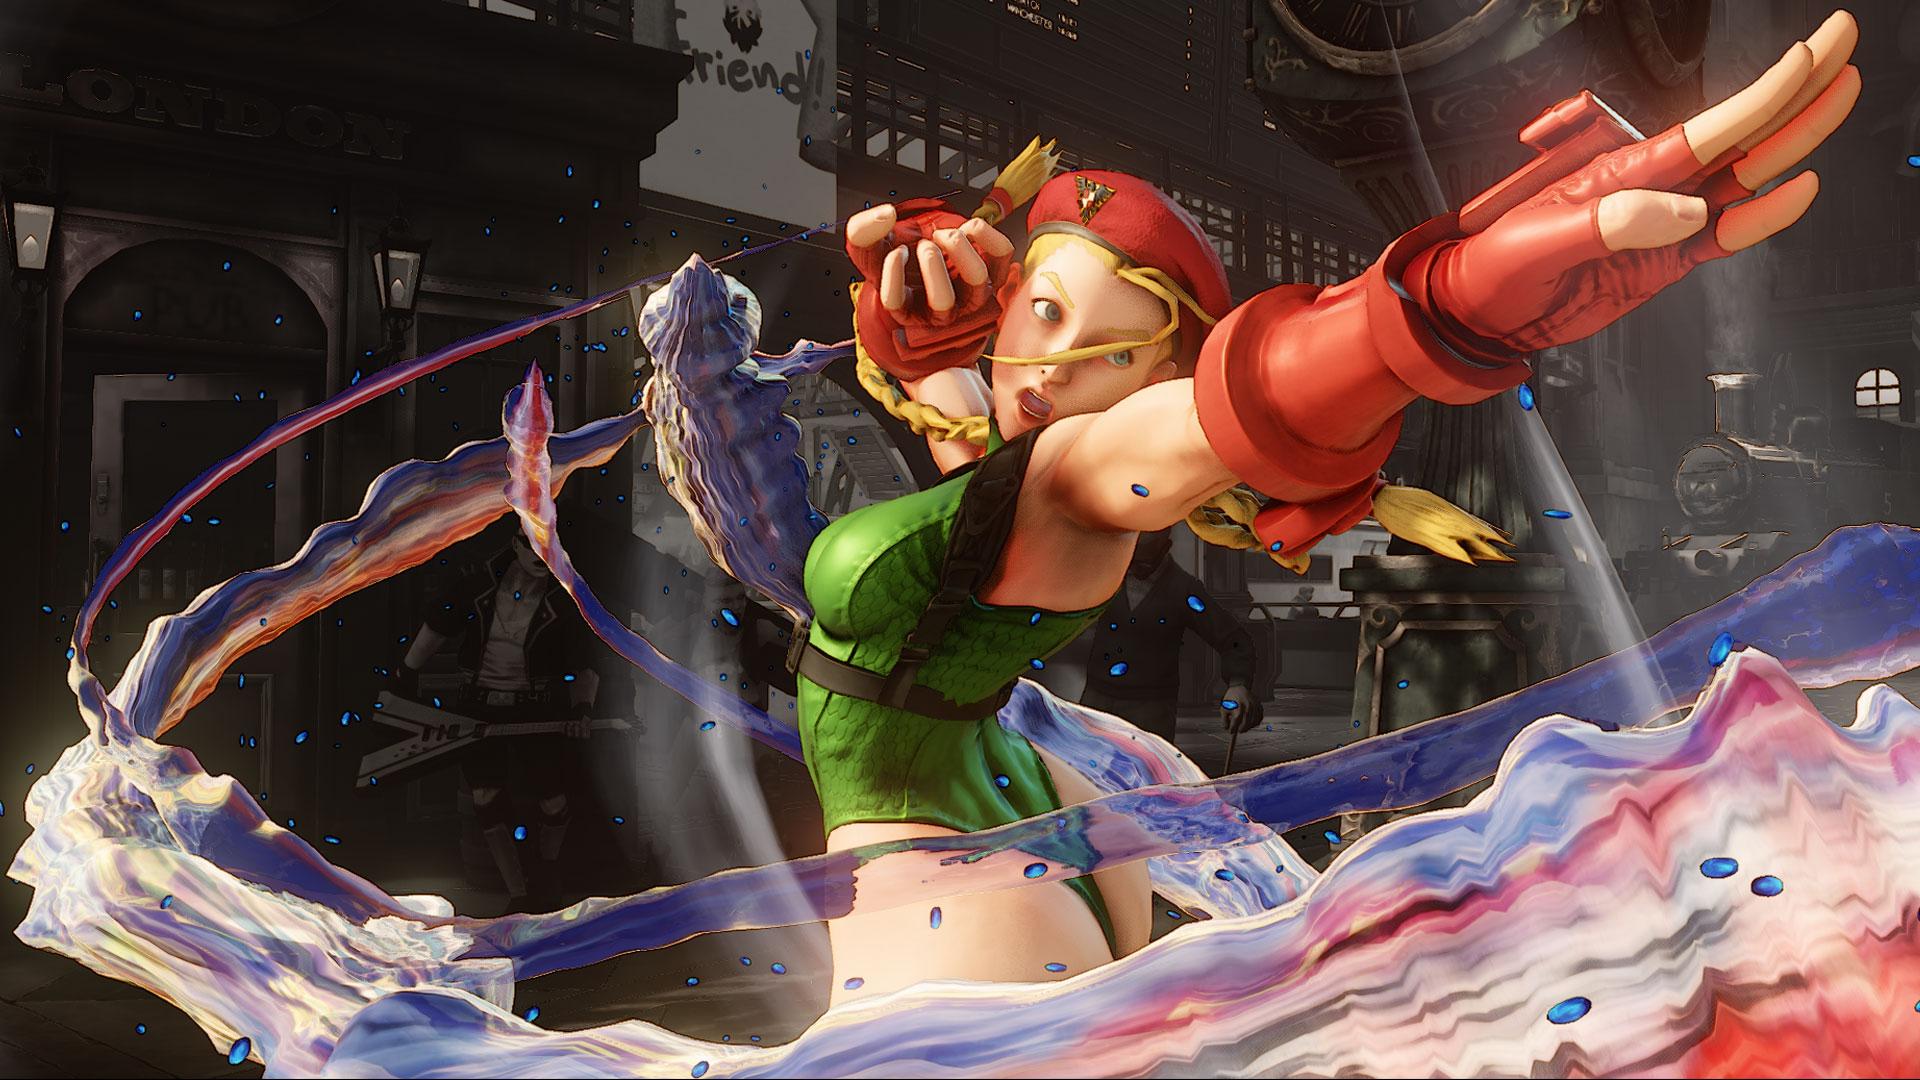 Cammy Street Fighter V HD Wallpaper | 1920x1080 | ID:58161